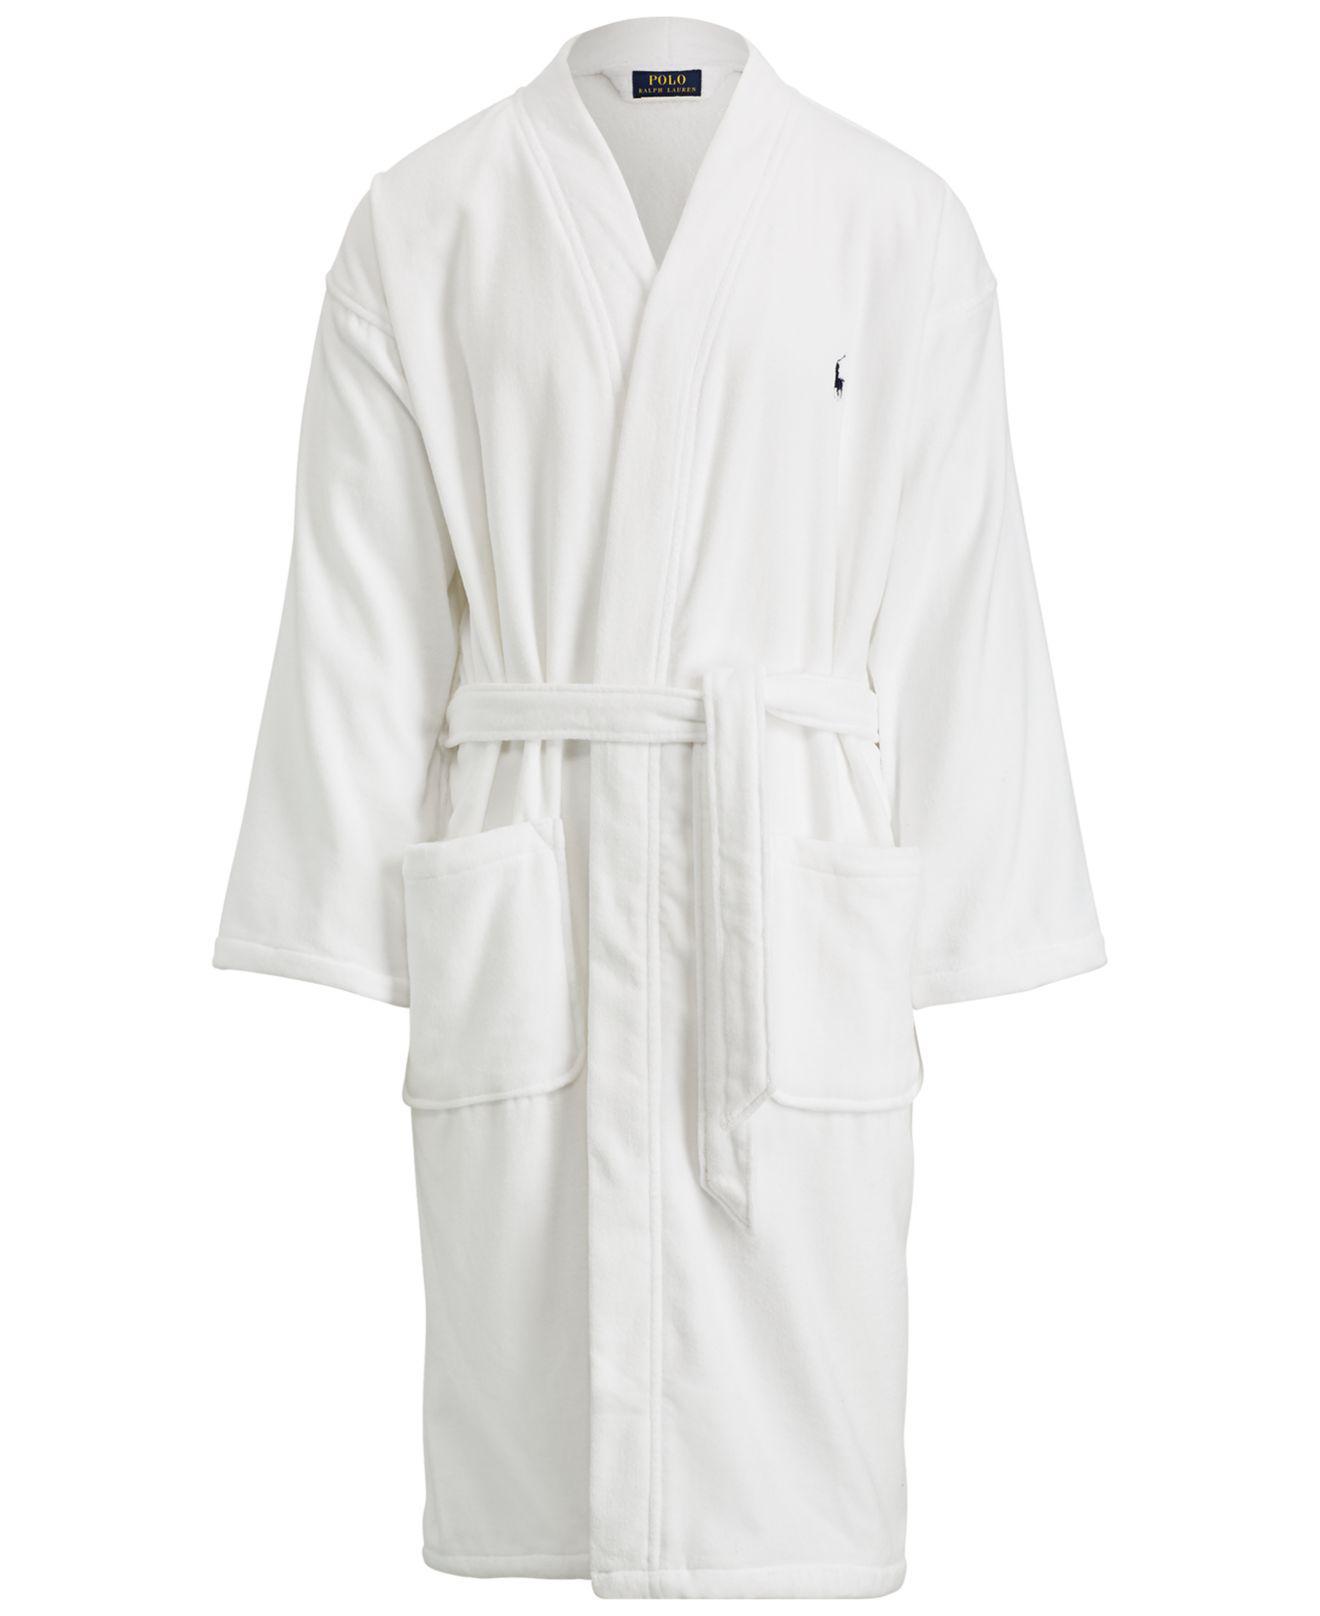 b5683e6b ... cheap lyst polo ralph lauren big tall shawl cotton robe in white for men  3db3c a93be